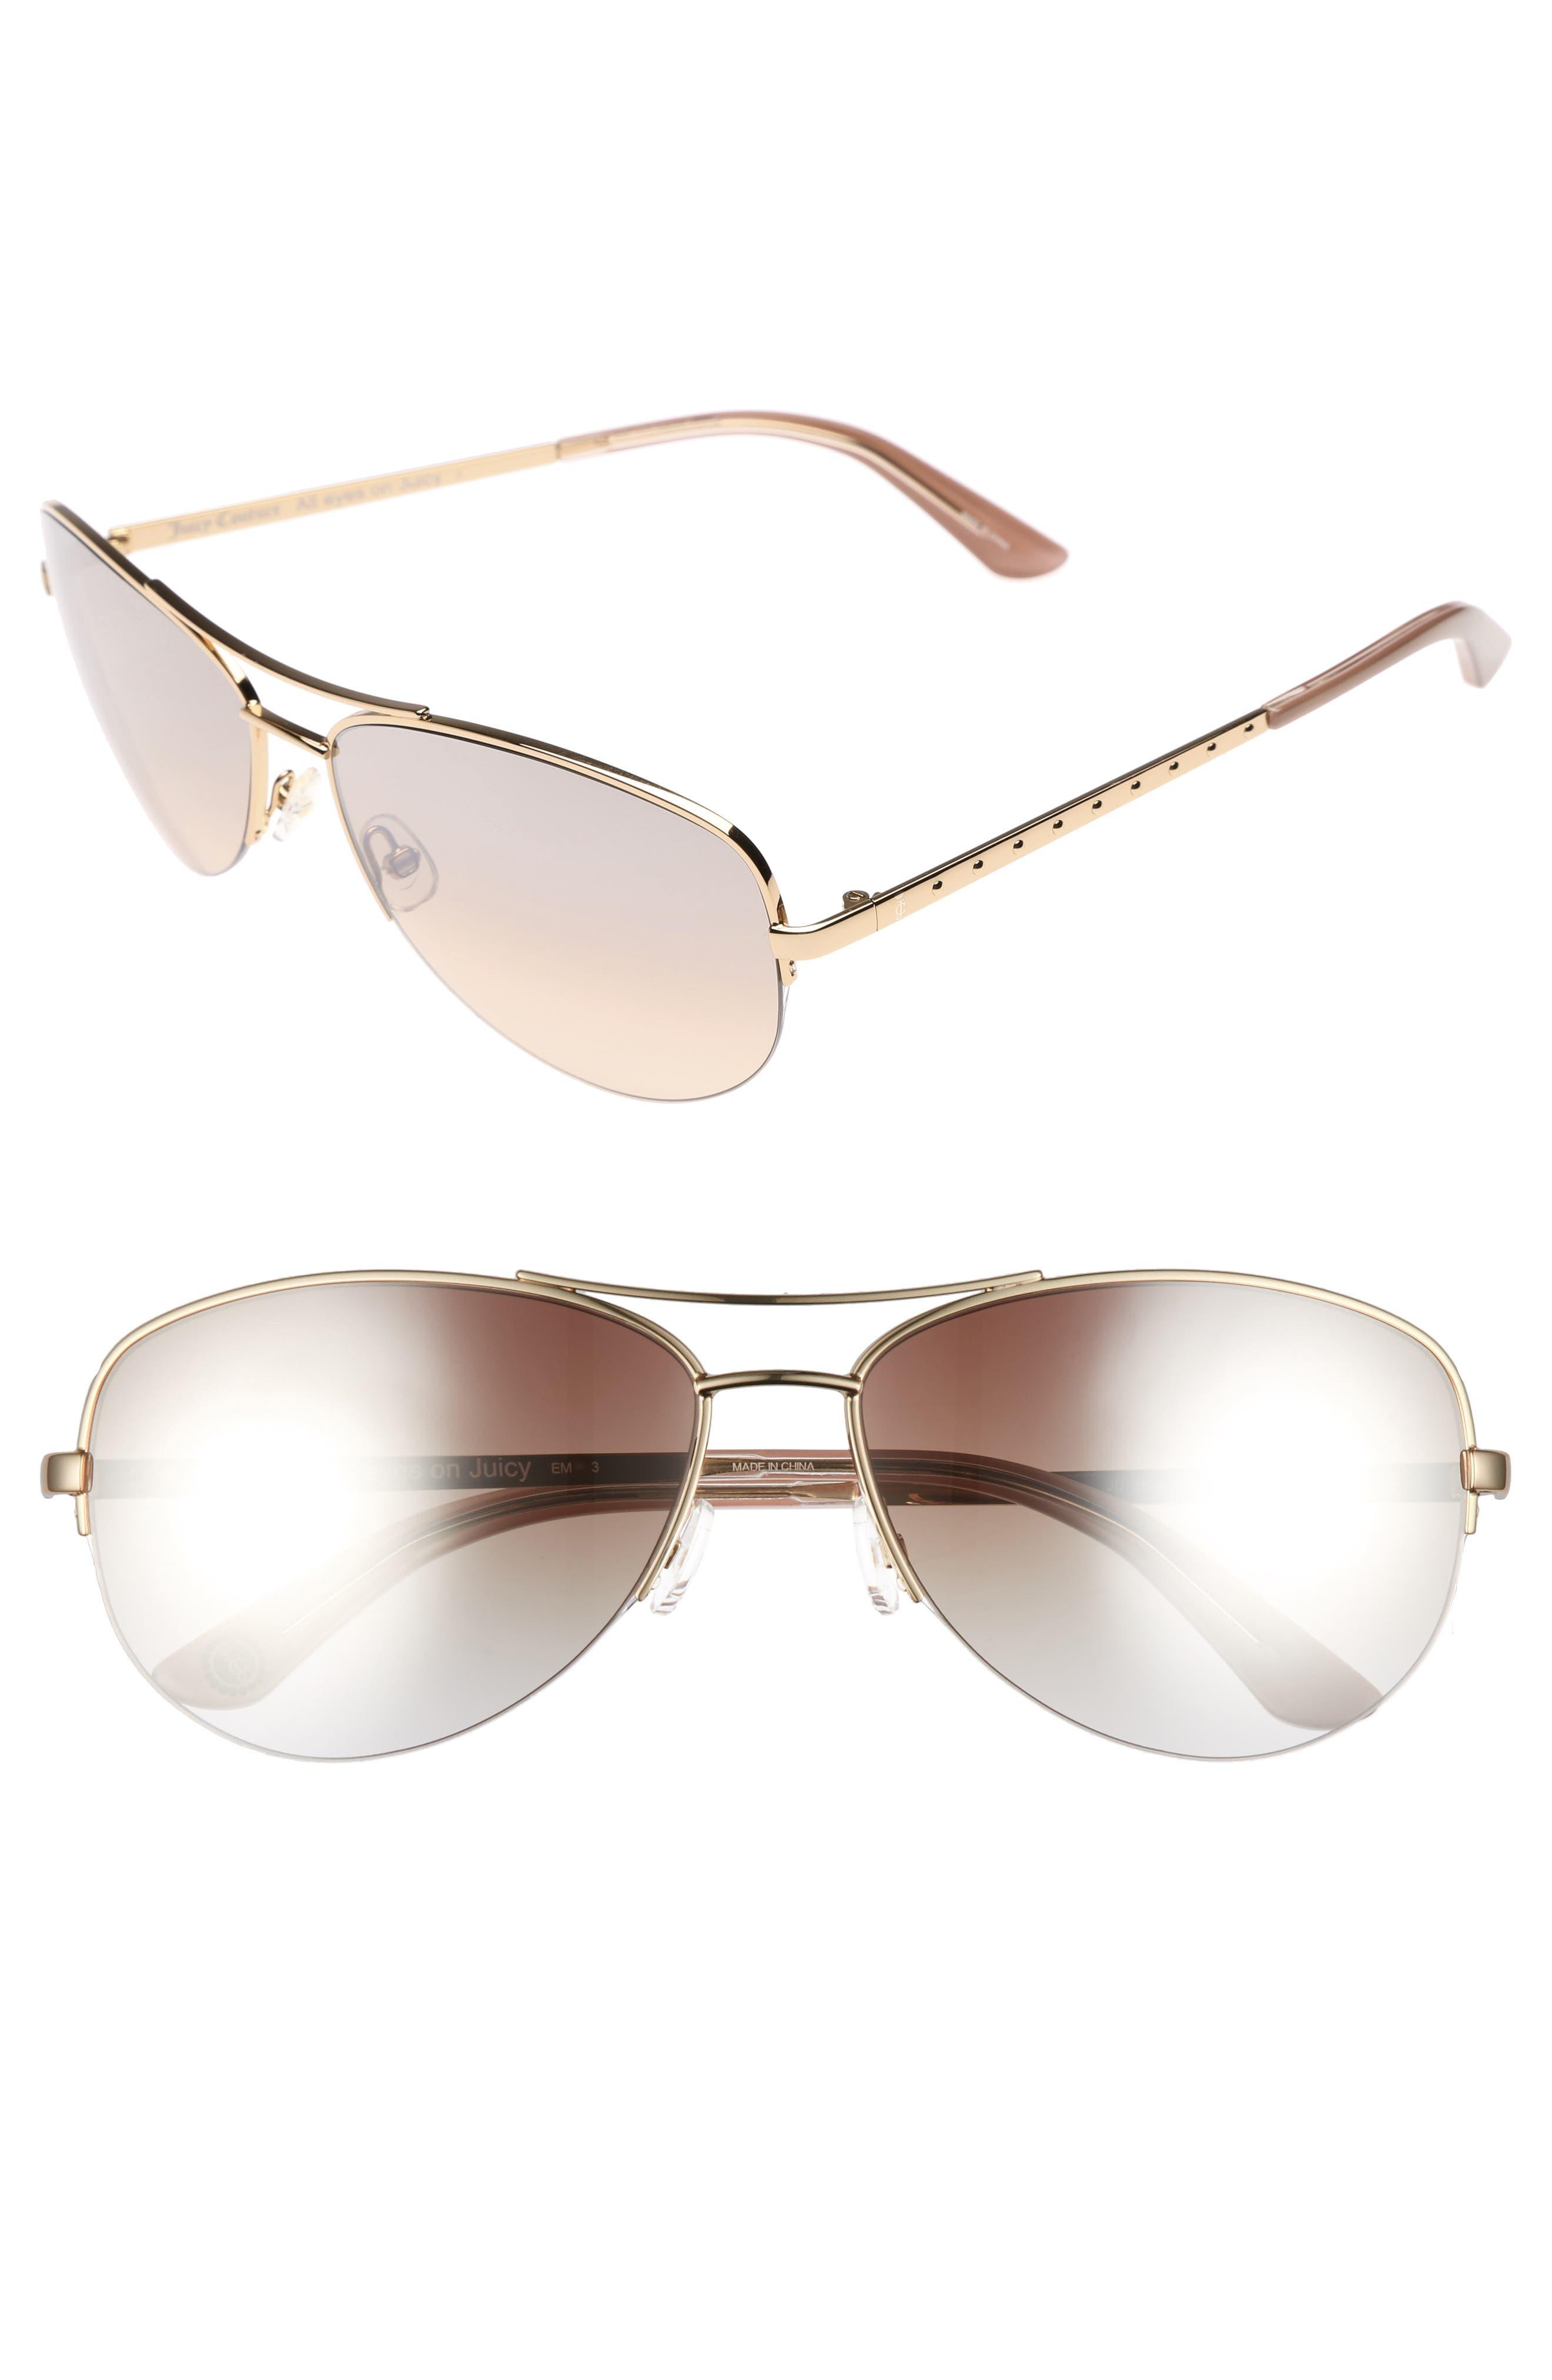 Black Label 60mm Gradient Aviator Sunglasses,                         Main,                         color, Light Gold